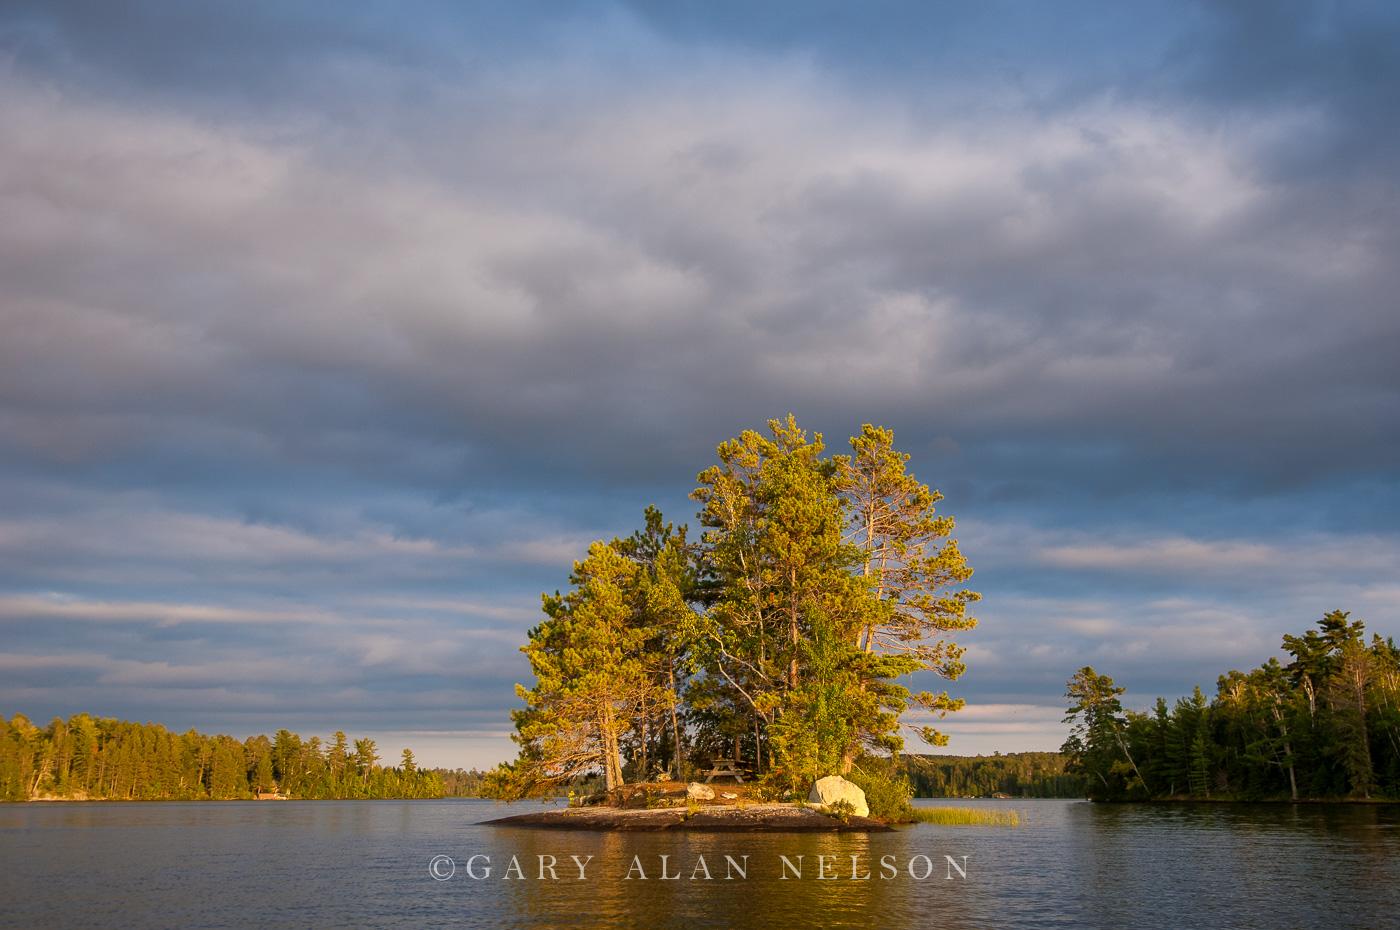 minnesota, lake, vermilion, storm clouds, island, photo